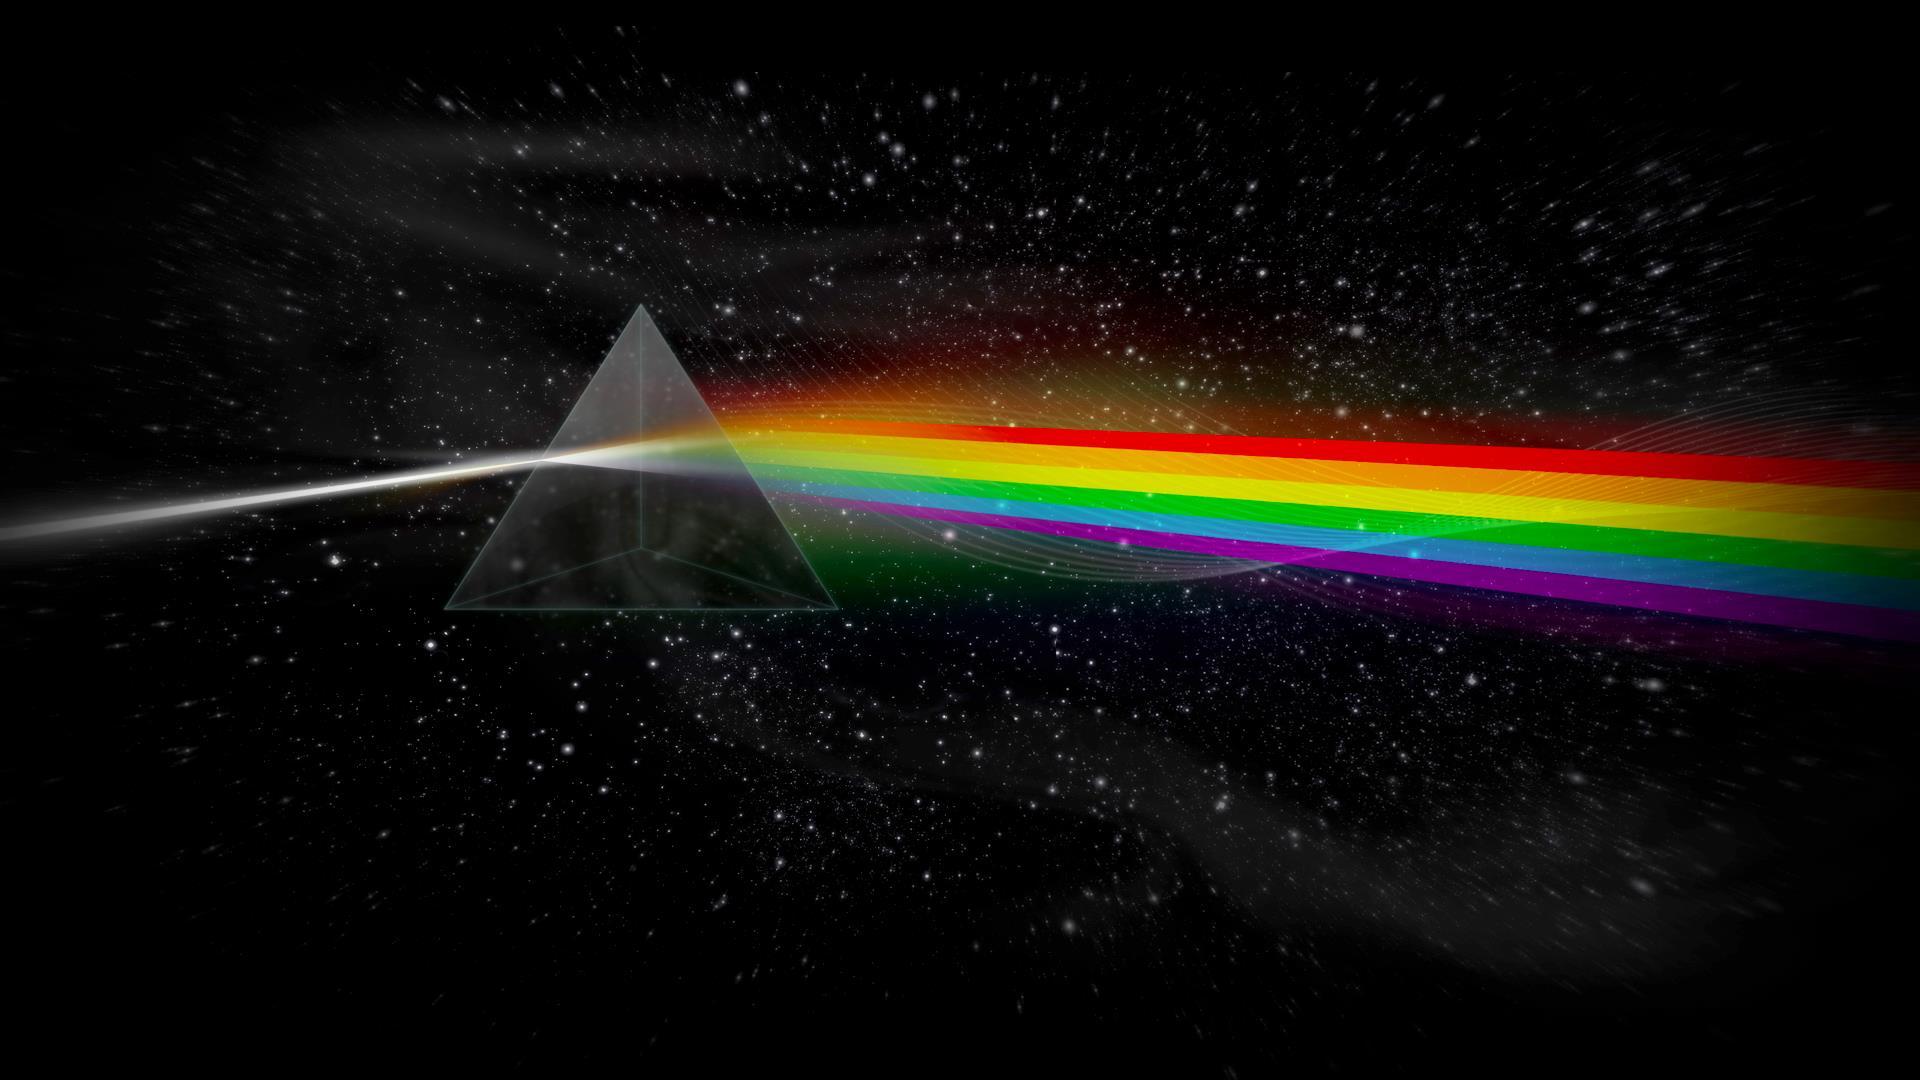 1920x1080 Pink Floyd Trippy Wallpaper